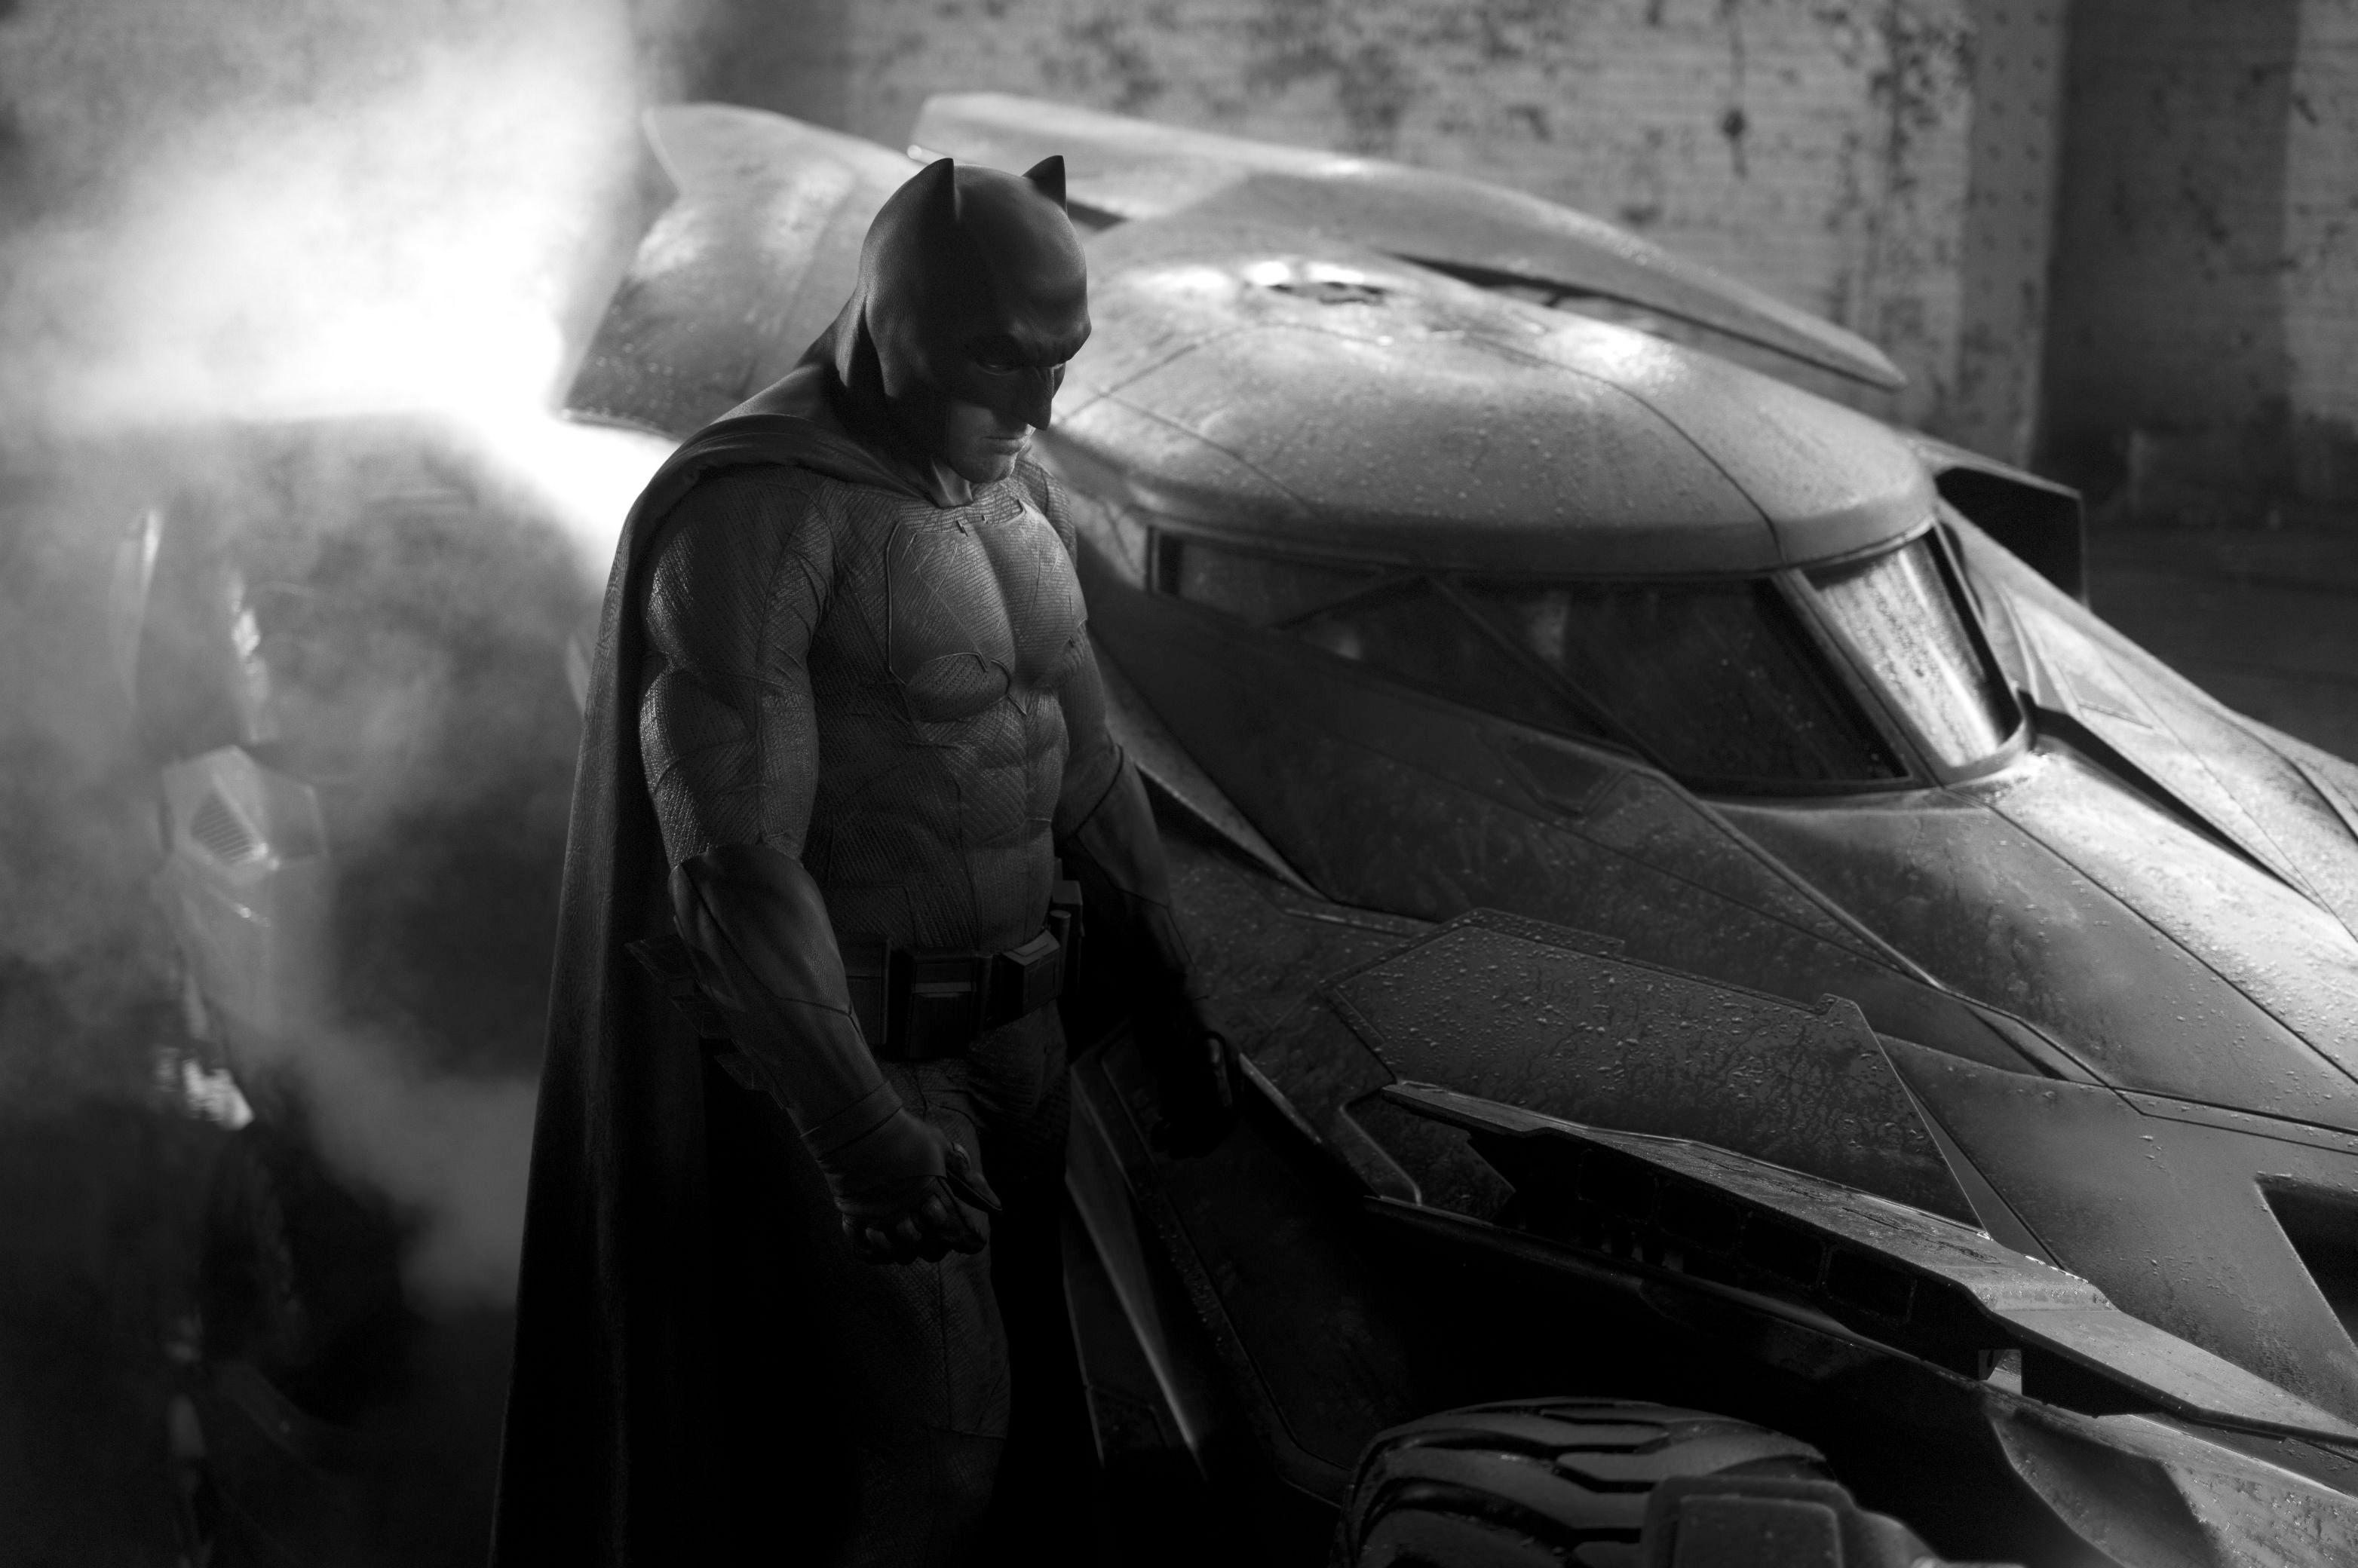 Batsuit Revealed Ben Affleck buff  and Affleck s close